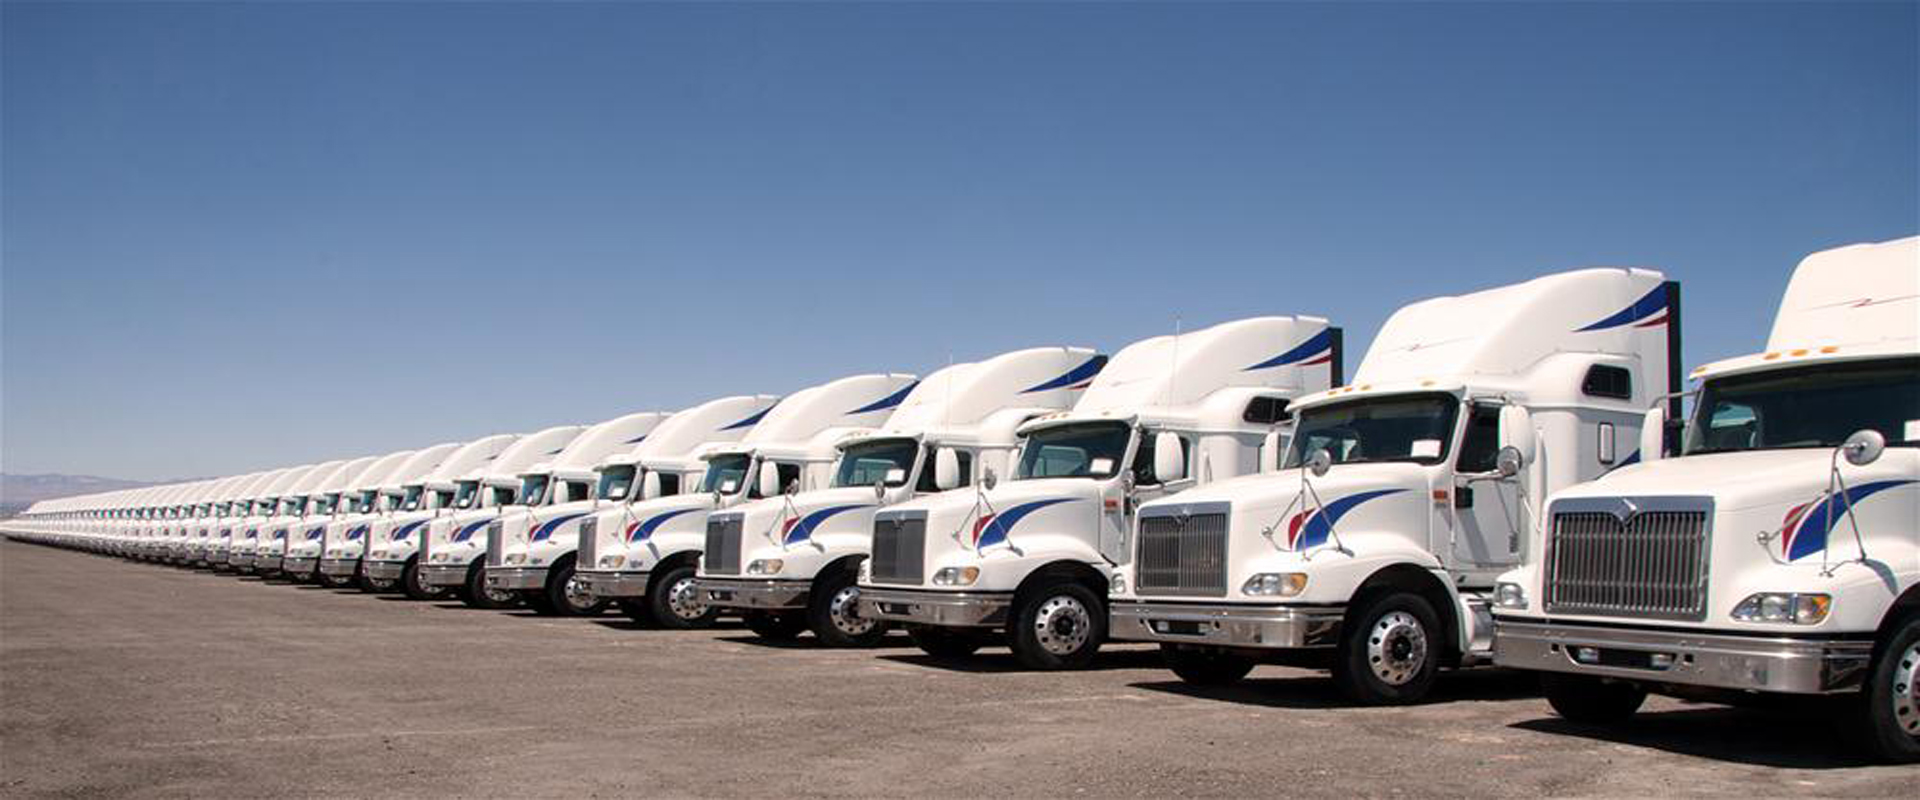 Car Dealership Fleet Mobile Car Washing Company St Louis MO_Slider